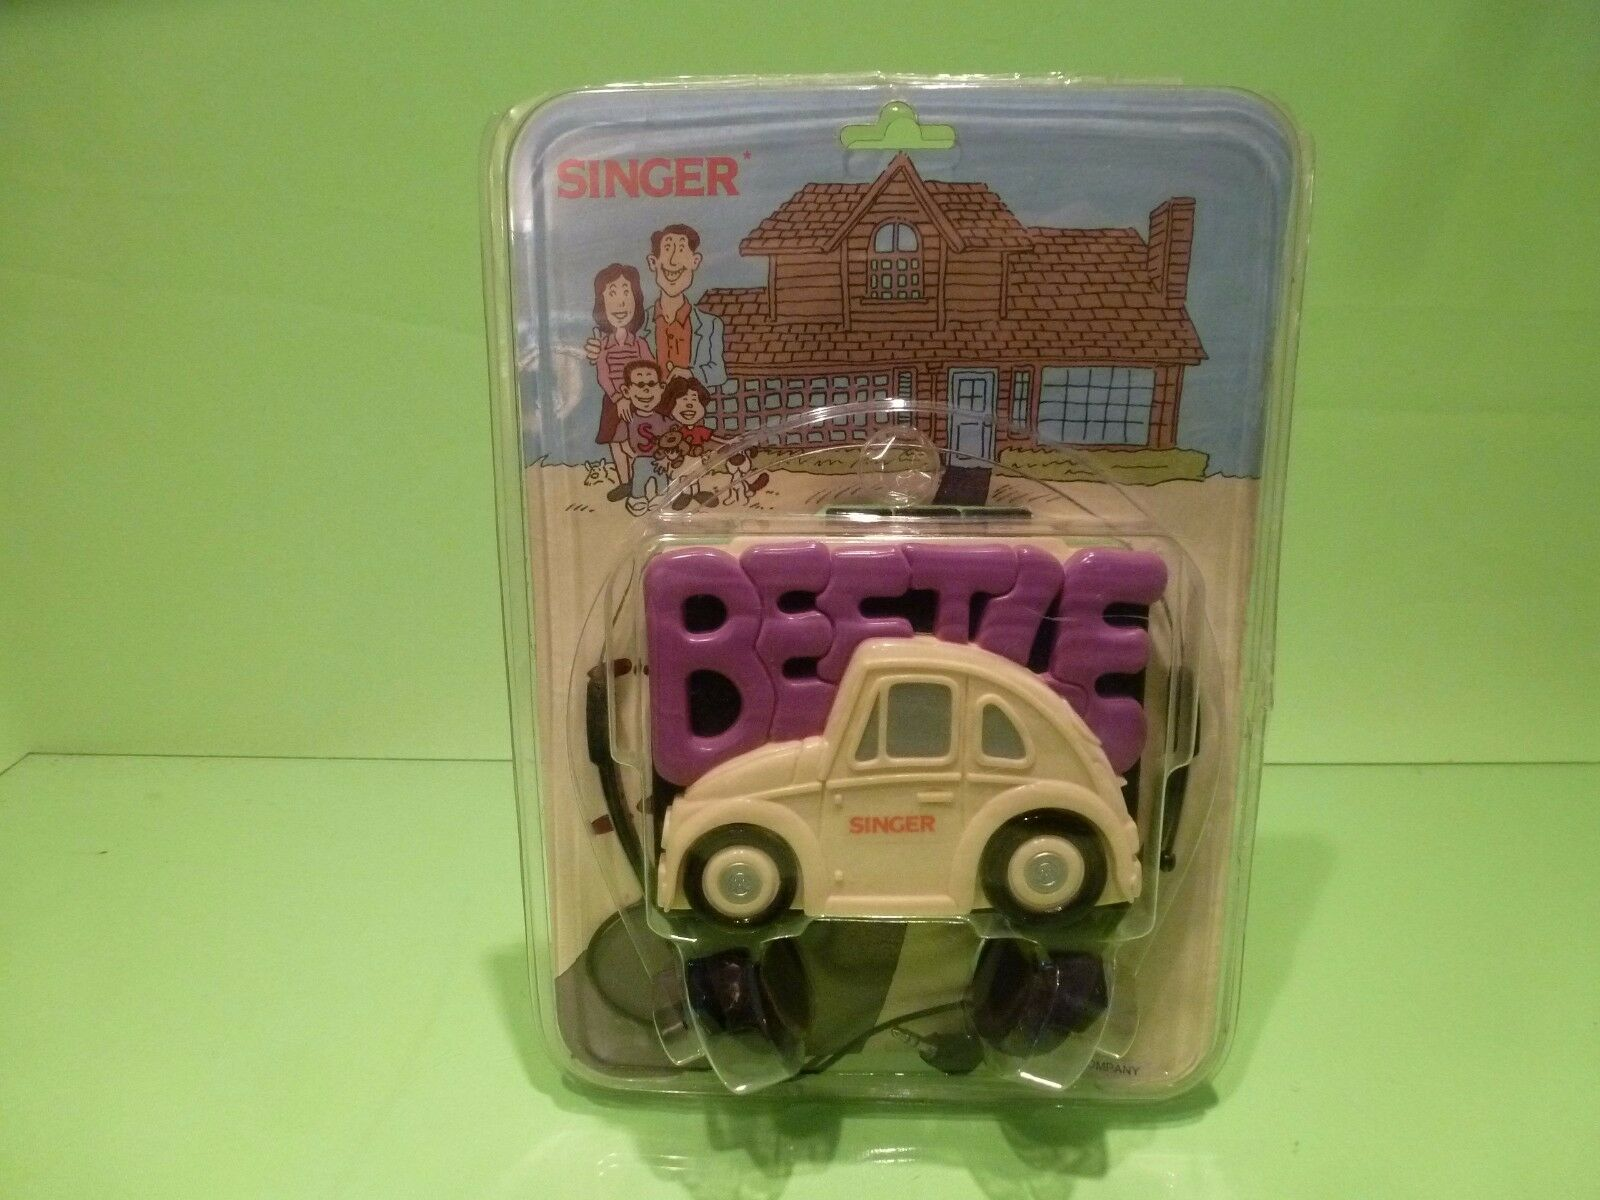 VINTAGE OLD WALKMAN SINGER VW VOLKSWAGEN BEETLE - TAPE CASSETTE GOOD IN BLISTER